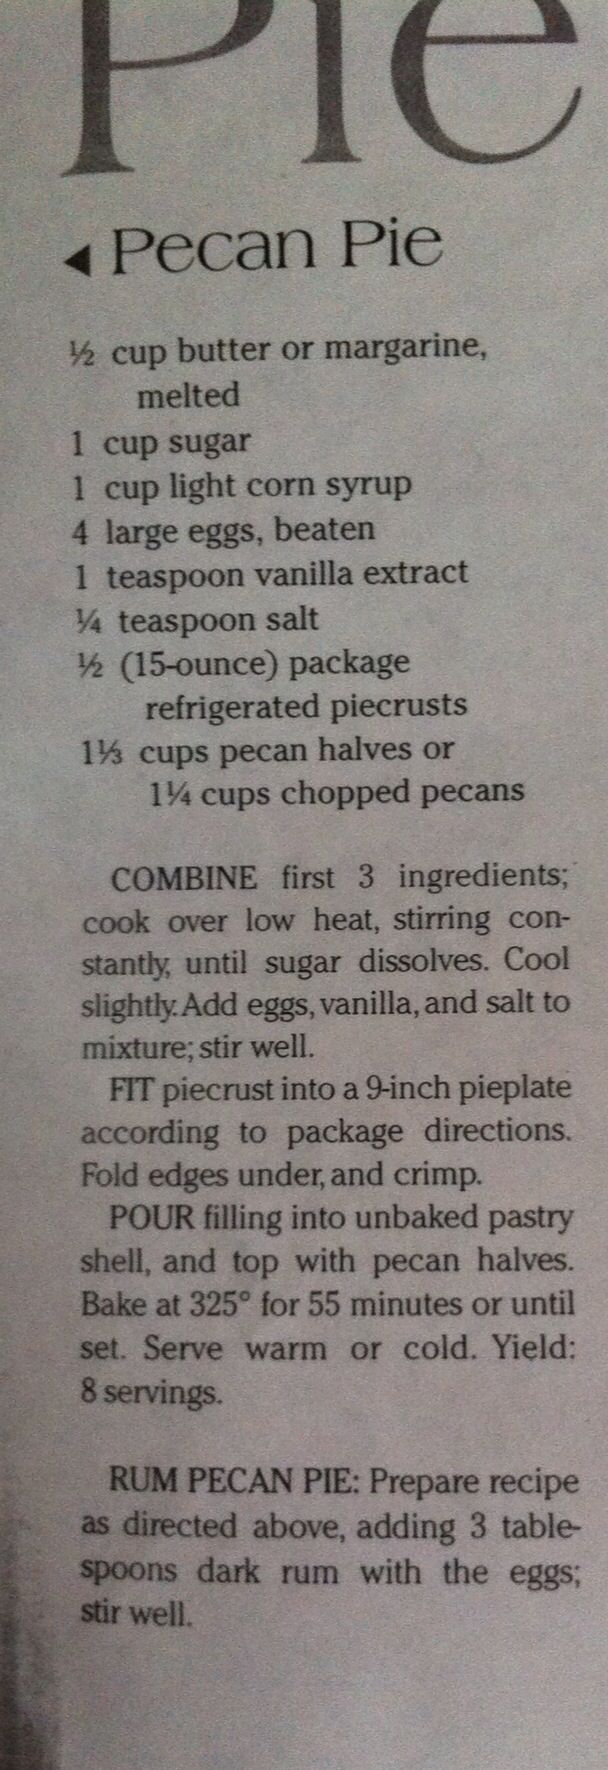 Southern Living Pecan Pie